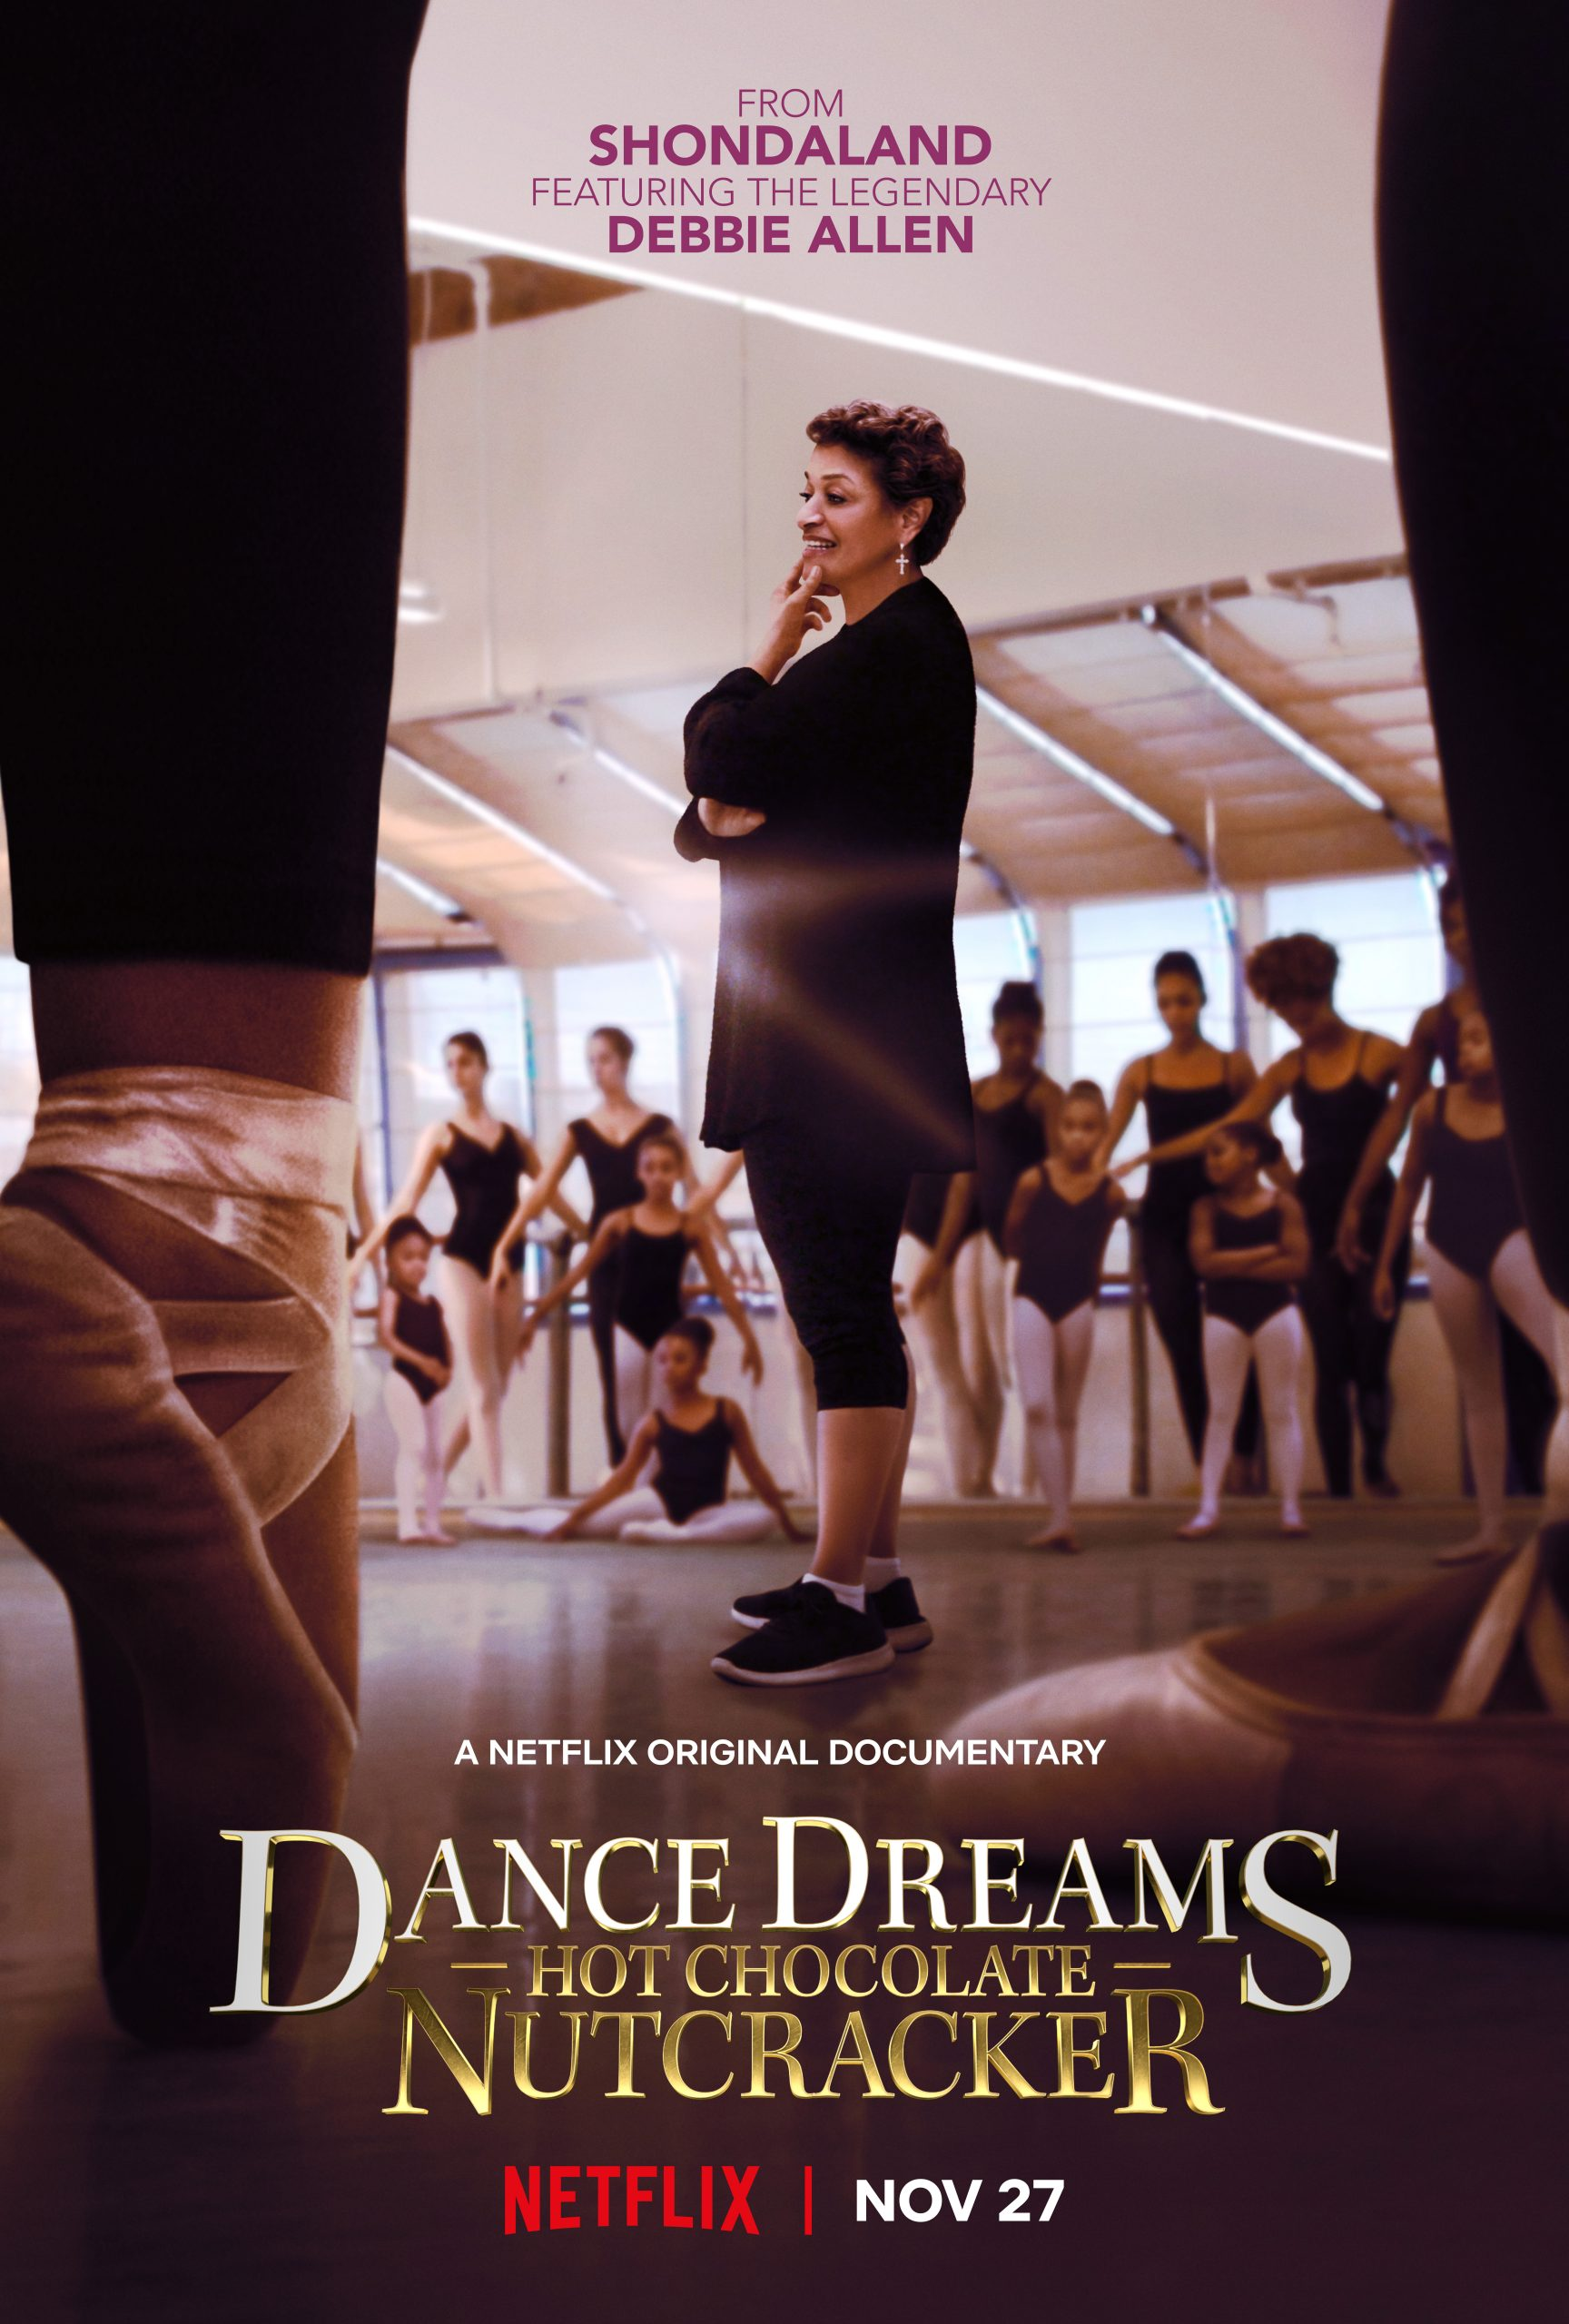 Netflix's Dance Dreams: Hot Chocolate Nutcracker Starring Debbie Allen